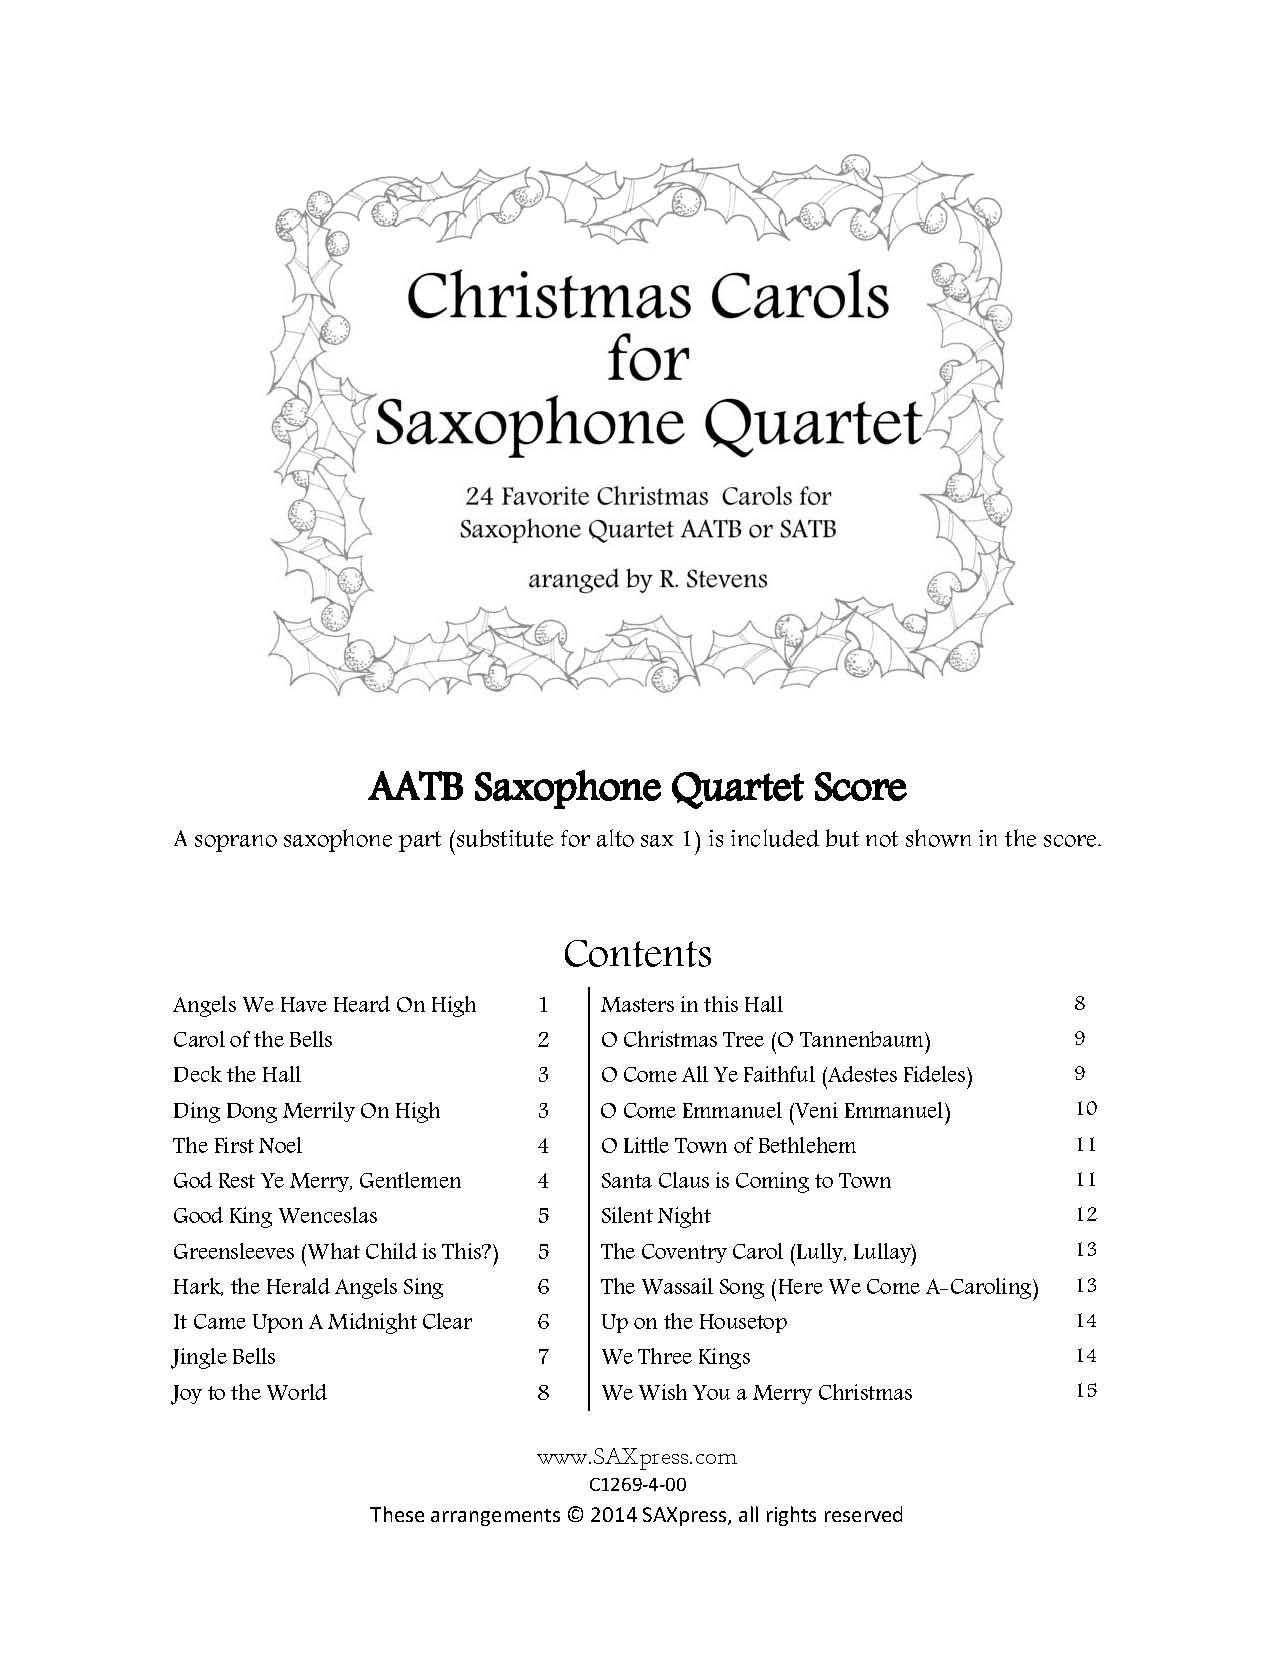 Christmas Carols for Saxophone Quartet, Volume 1 SATB or AATB